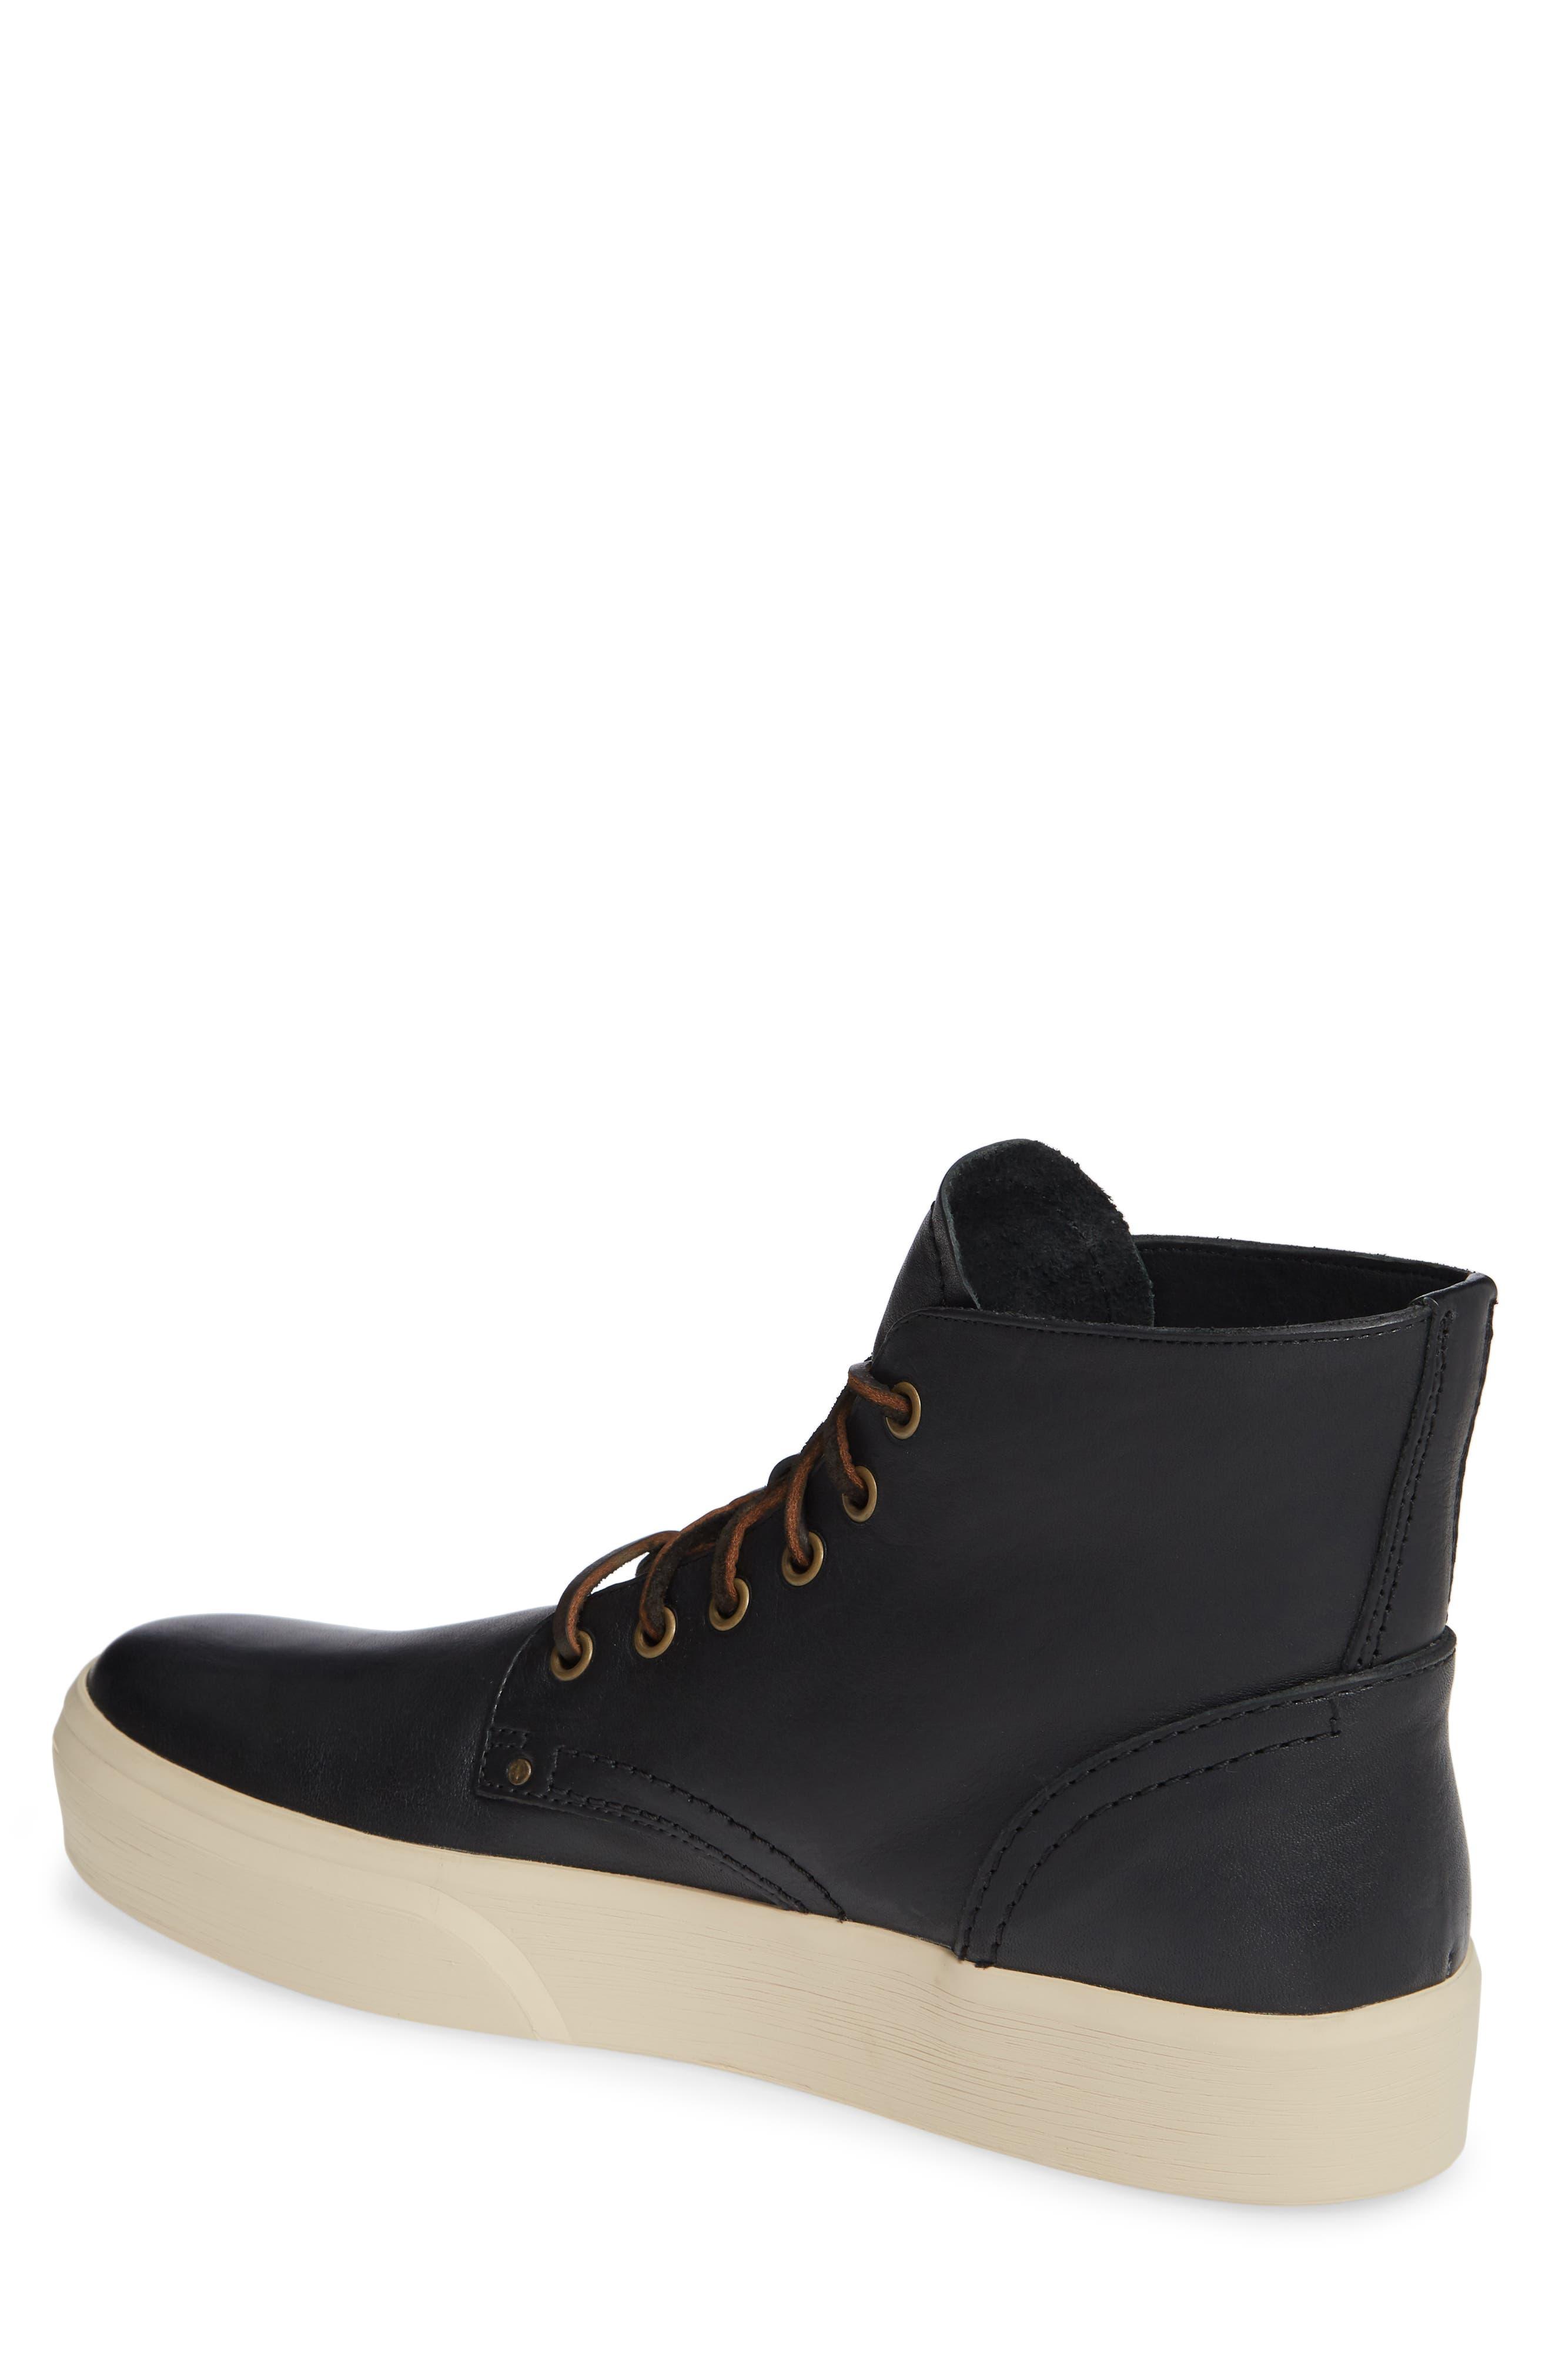 Beacon High Top Platform Sneaker,                             Alternate thumbnail 2, color,                             BLACK